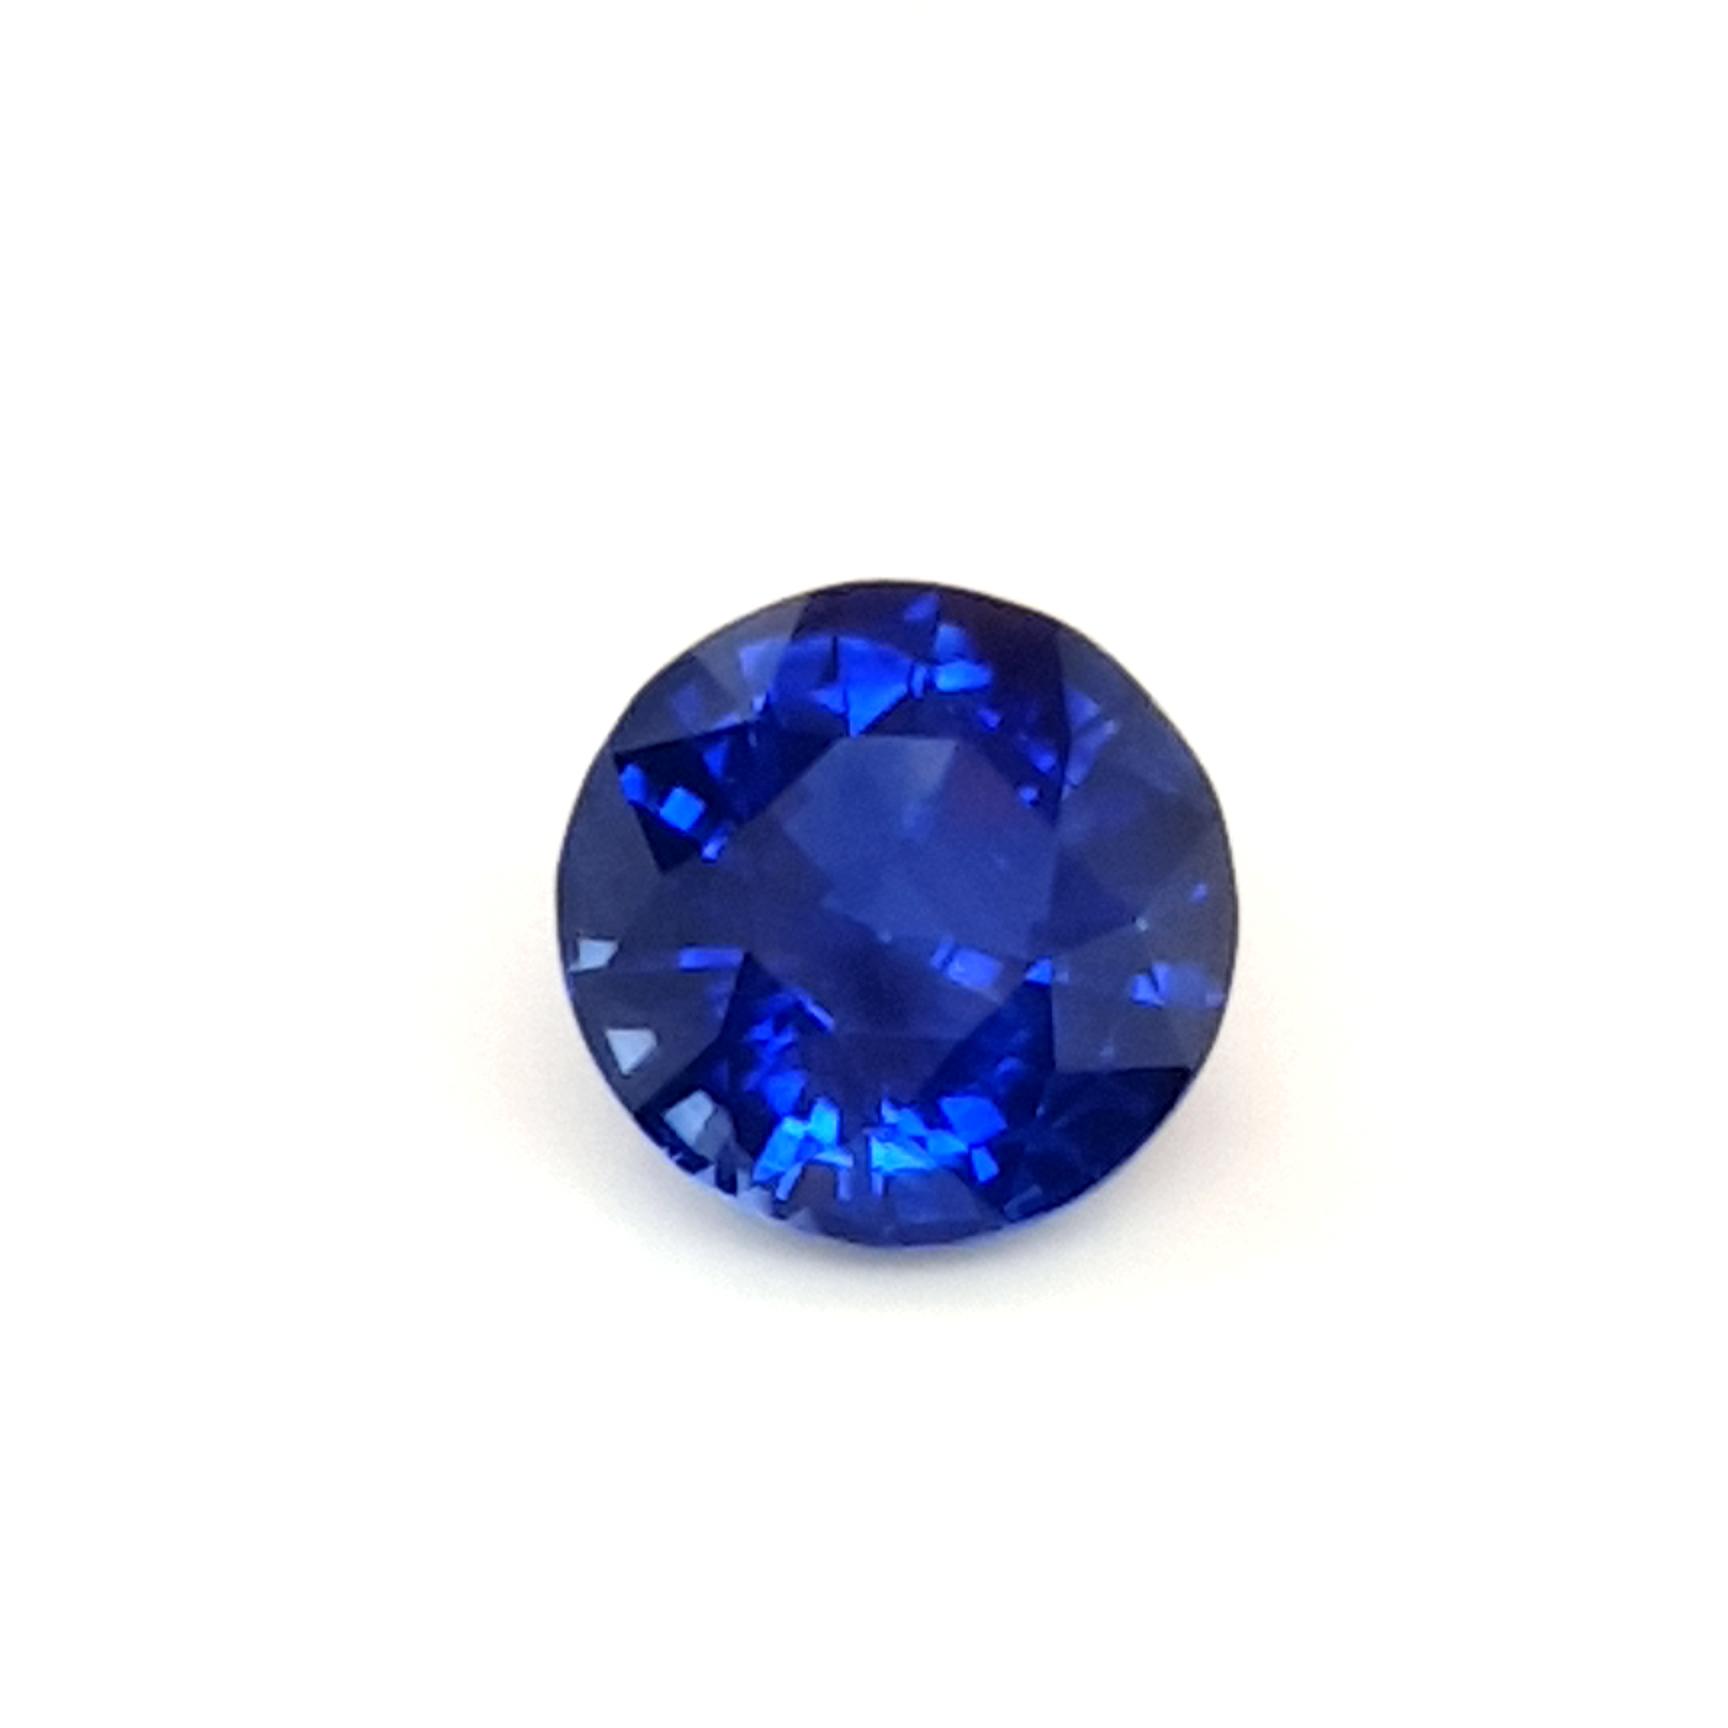 4,53ct. Sapphire Round RoyalBlue SAC16D5 ClaudiaHamann__2021-06-03-10-18-06